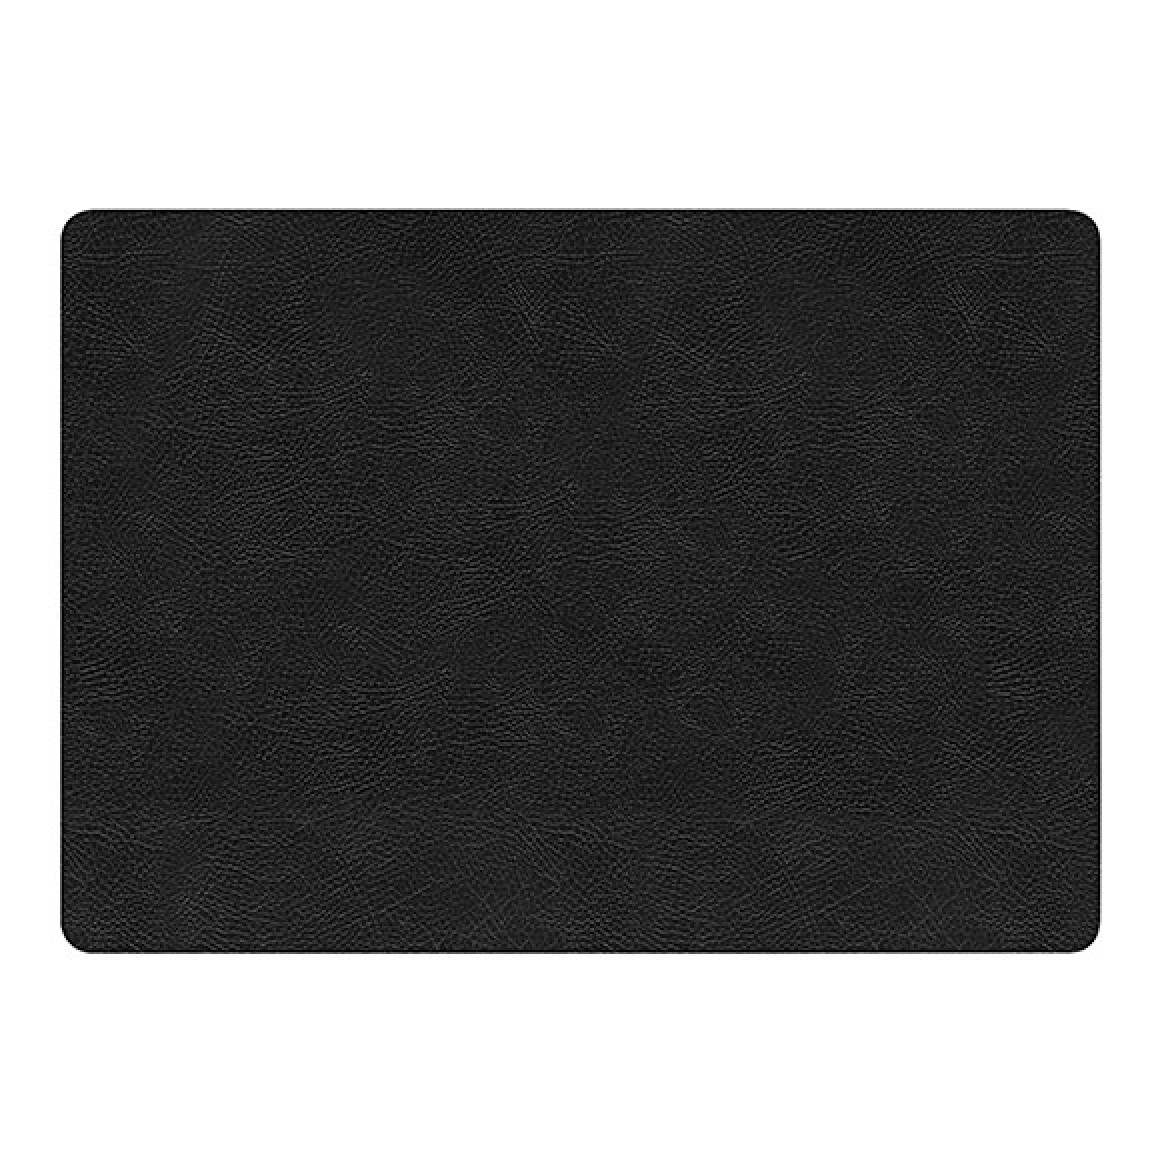 Adesivo Estampa Couro Para Magic Trackpad 2 2015 A1535